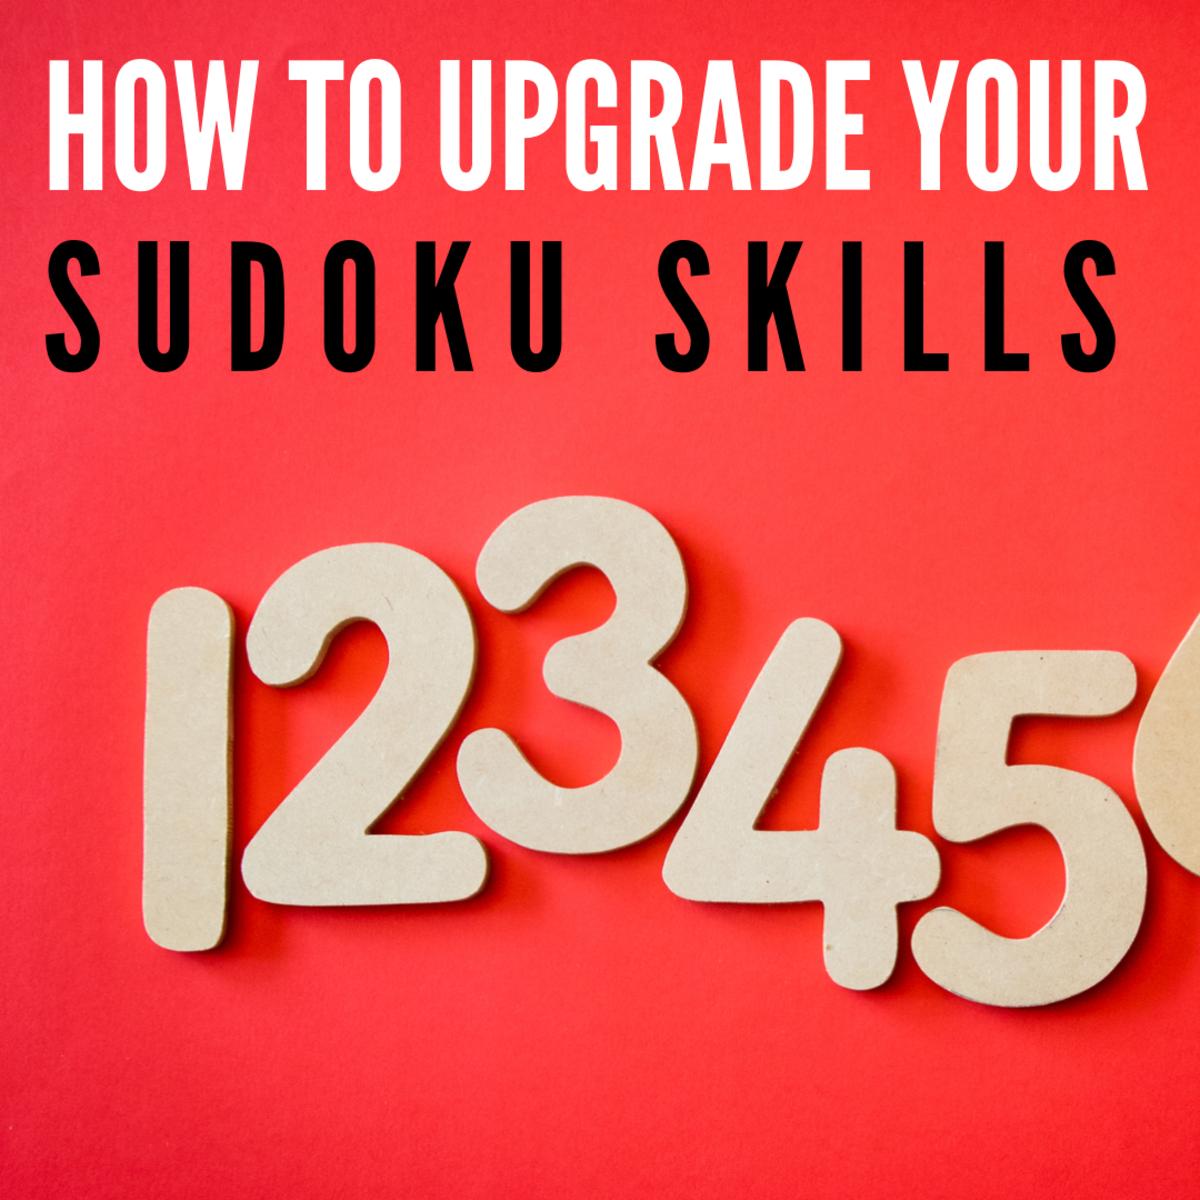 Tips for Mastering Sudoku